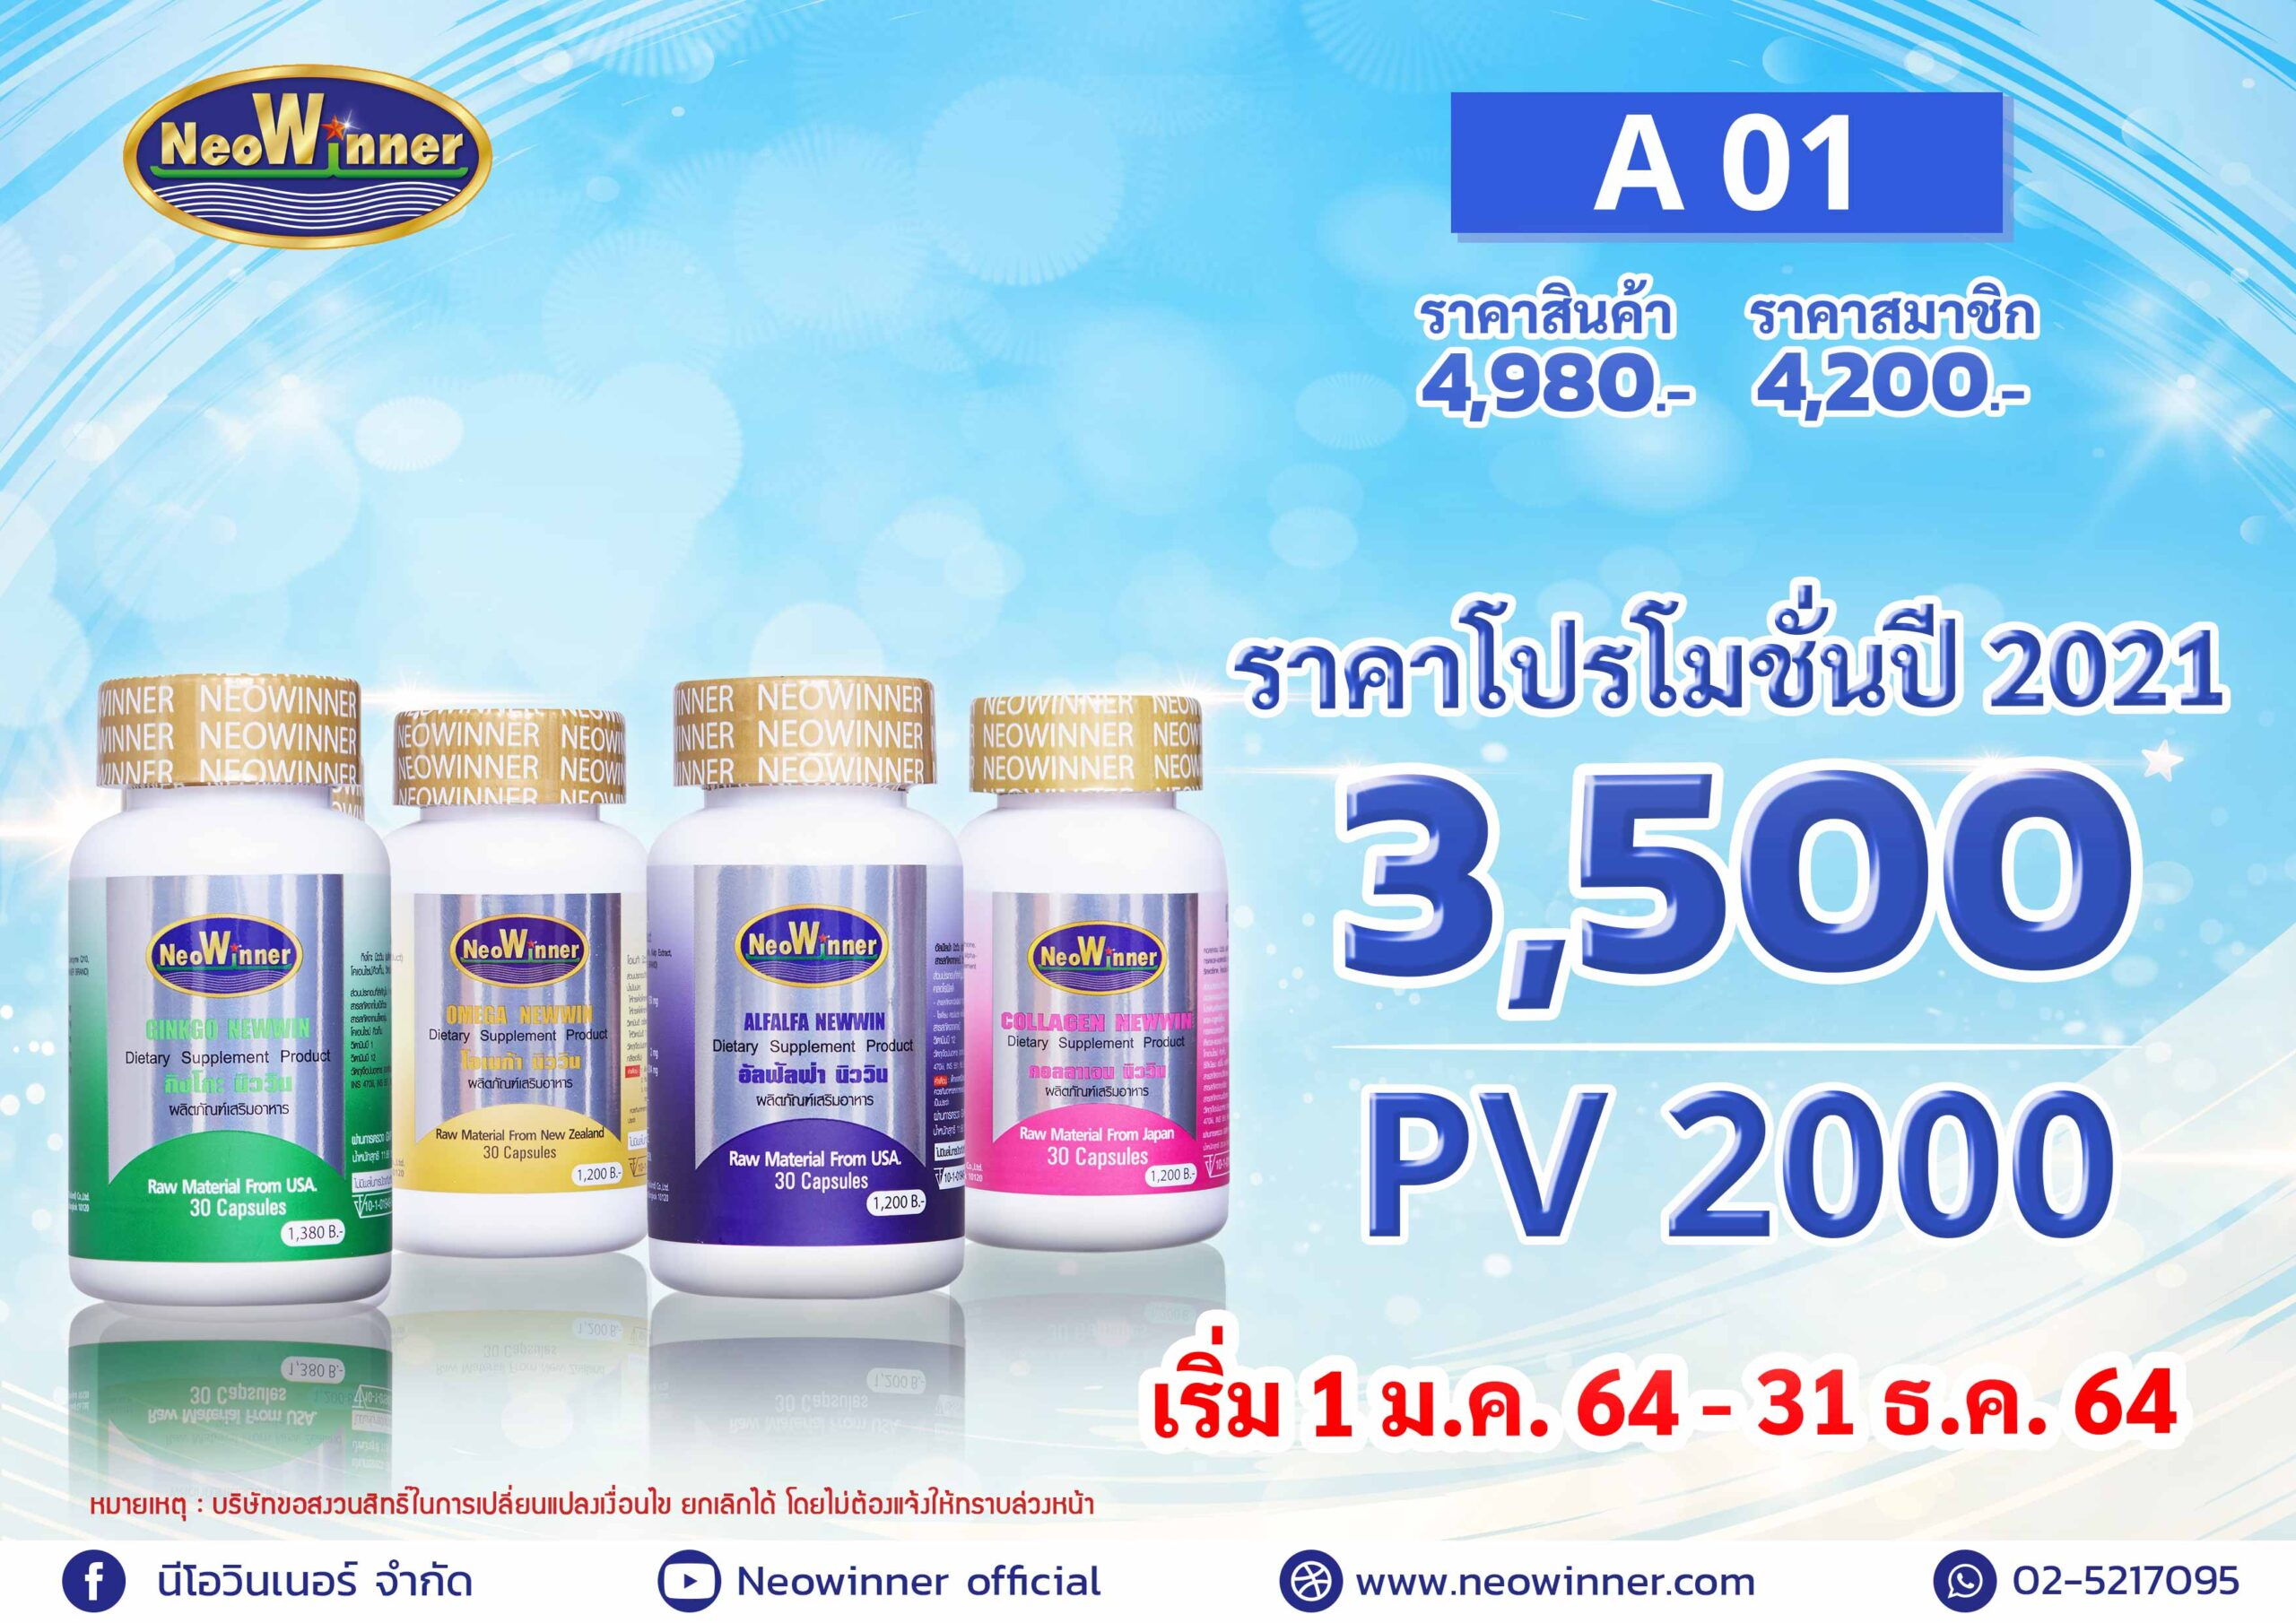 Promotion-A-01-2021